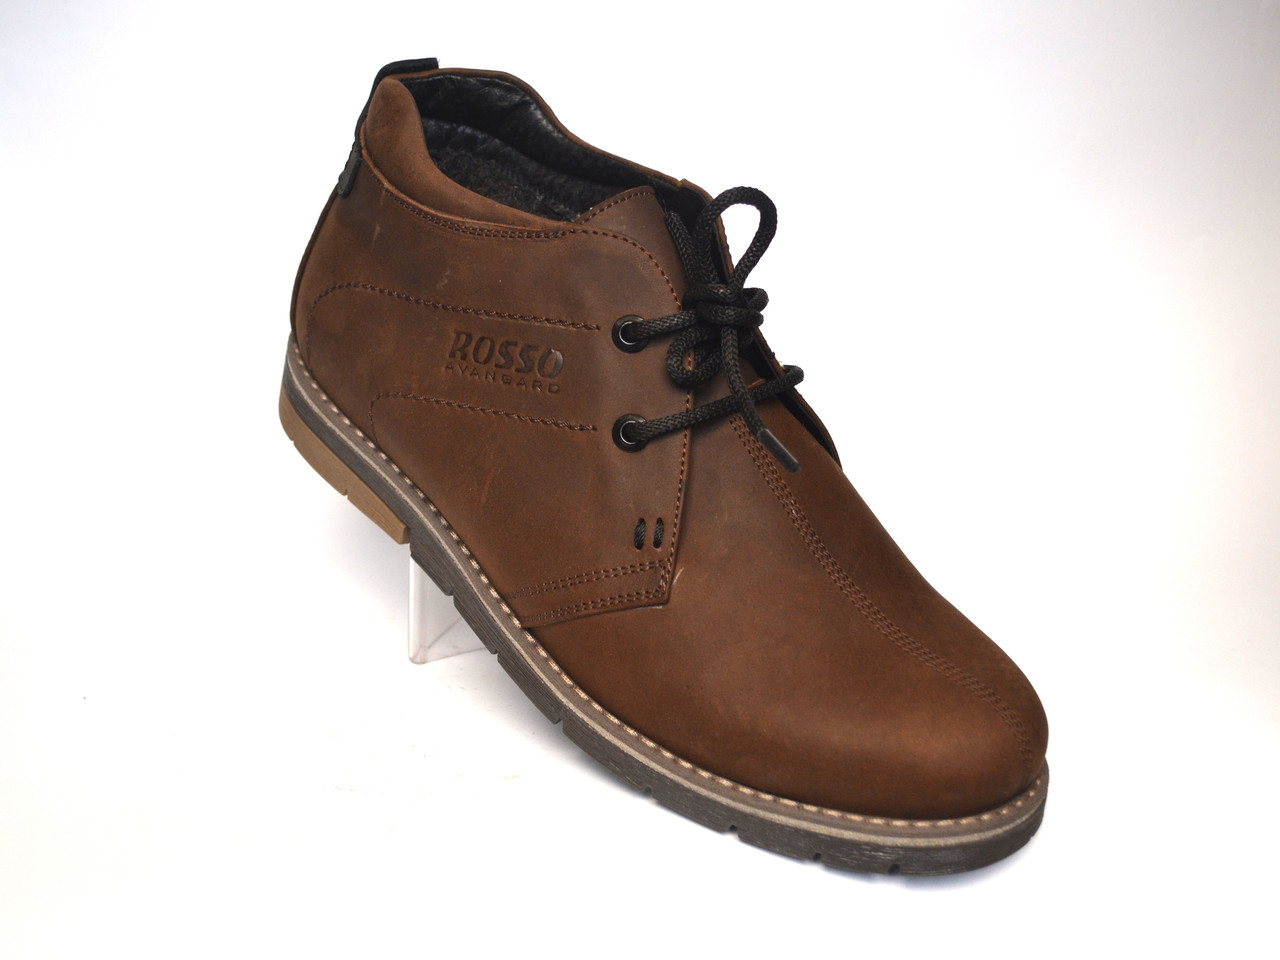 ba565979161 Коричневые зимние мужские ботинки дезерты кожаные Rosso Avangard. King Brown